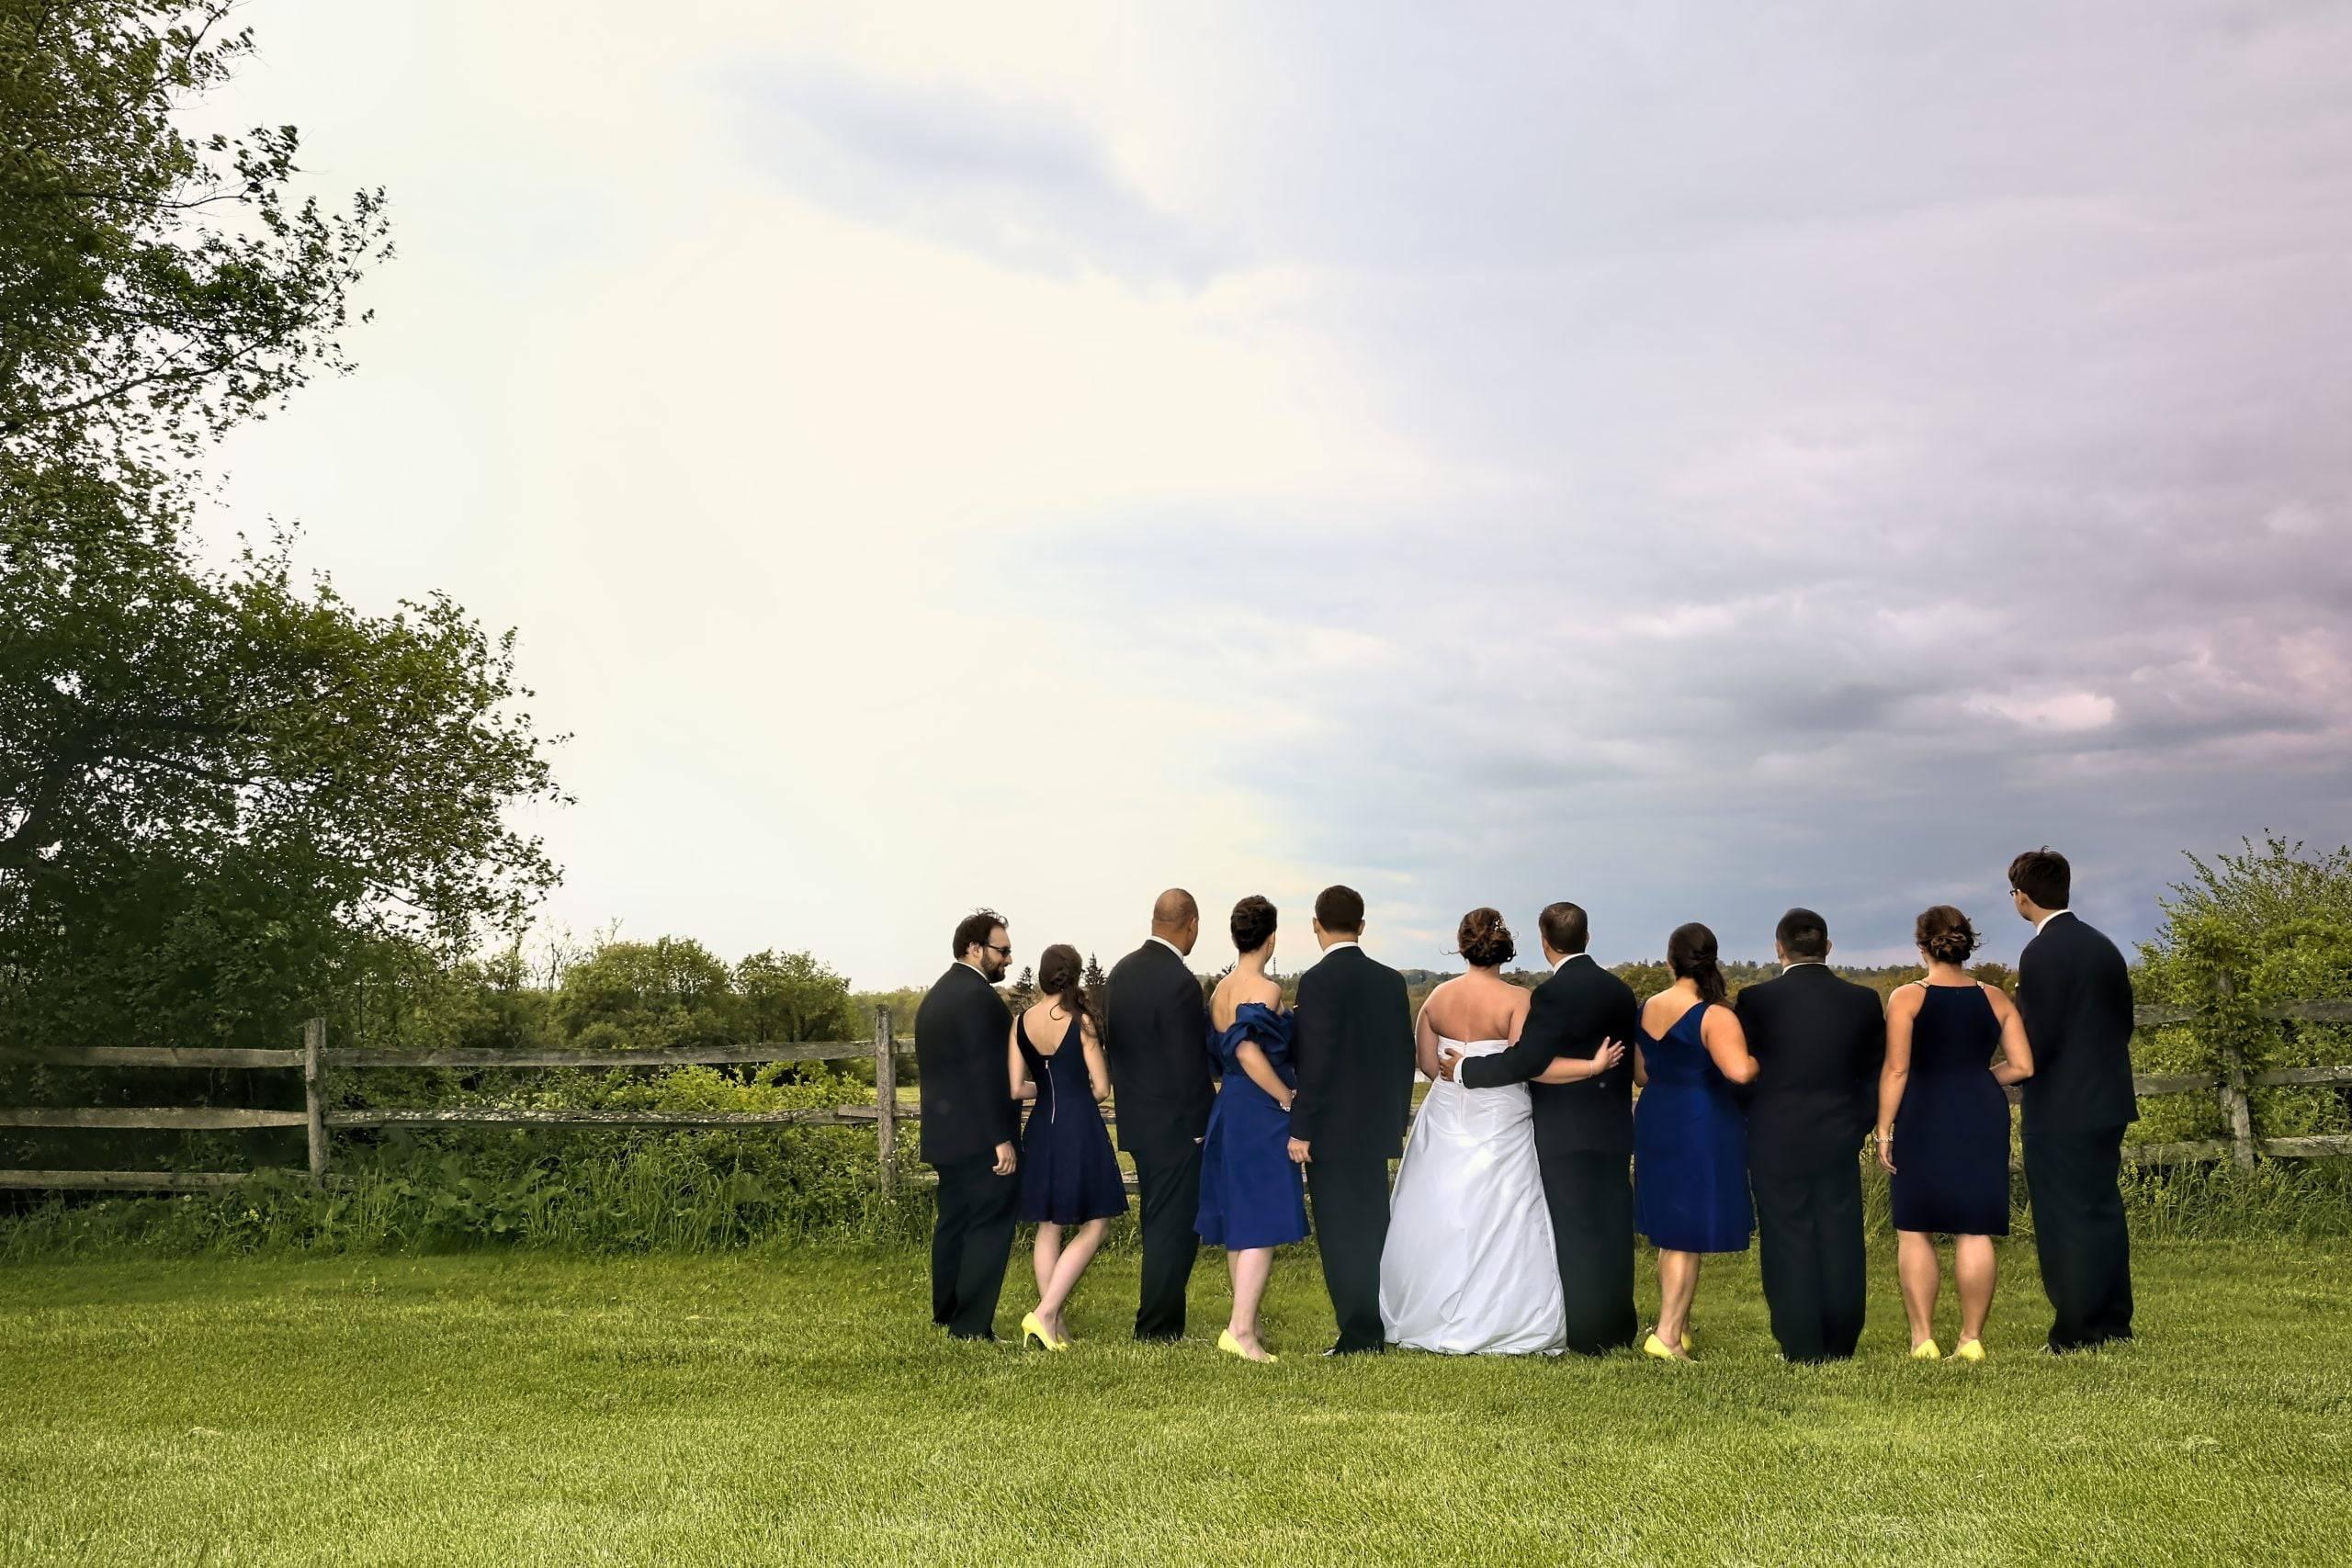 Basking Ridge CC bridal party from behind